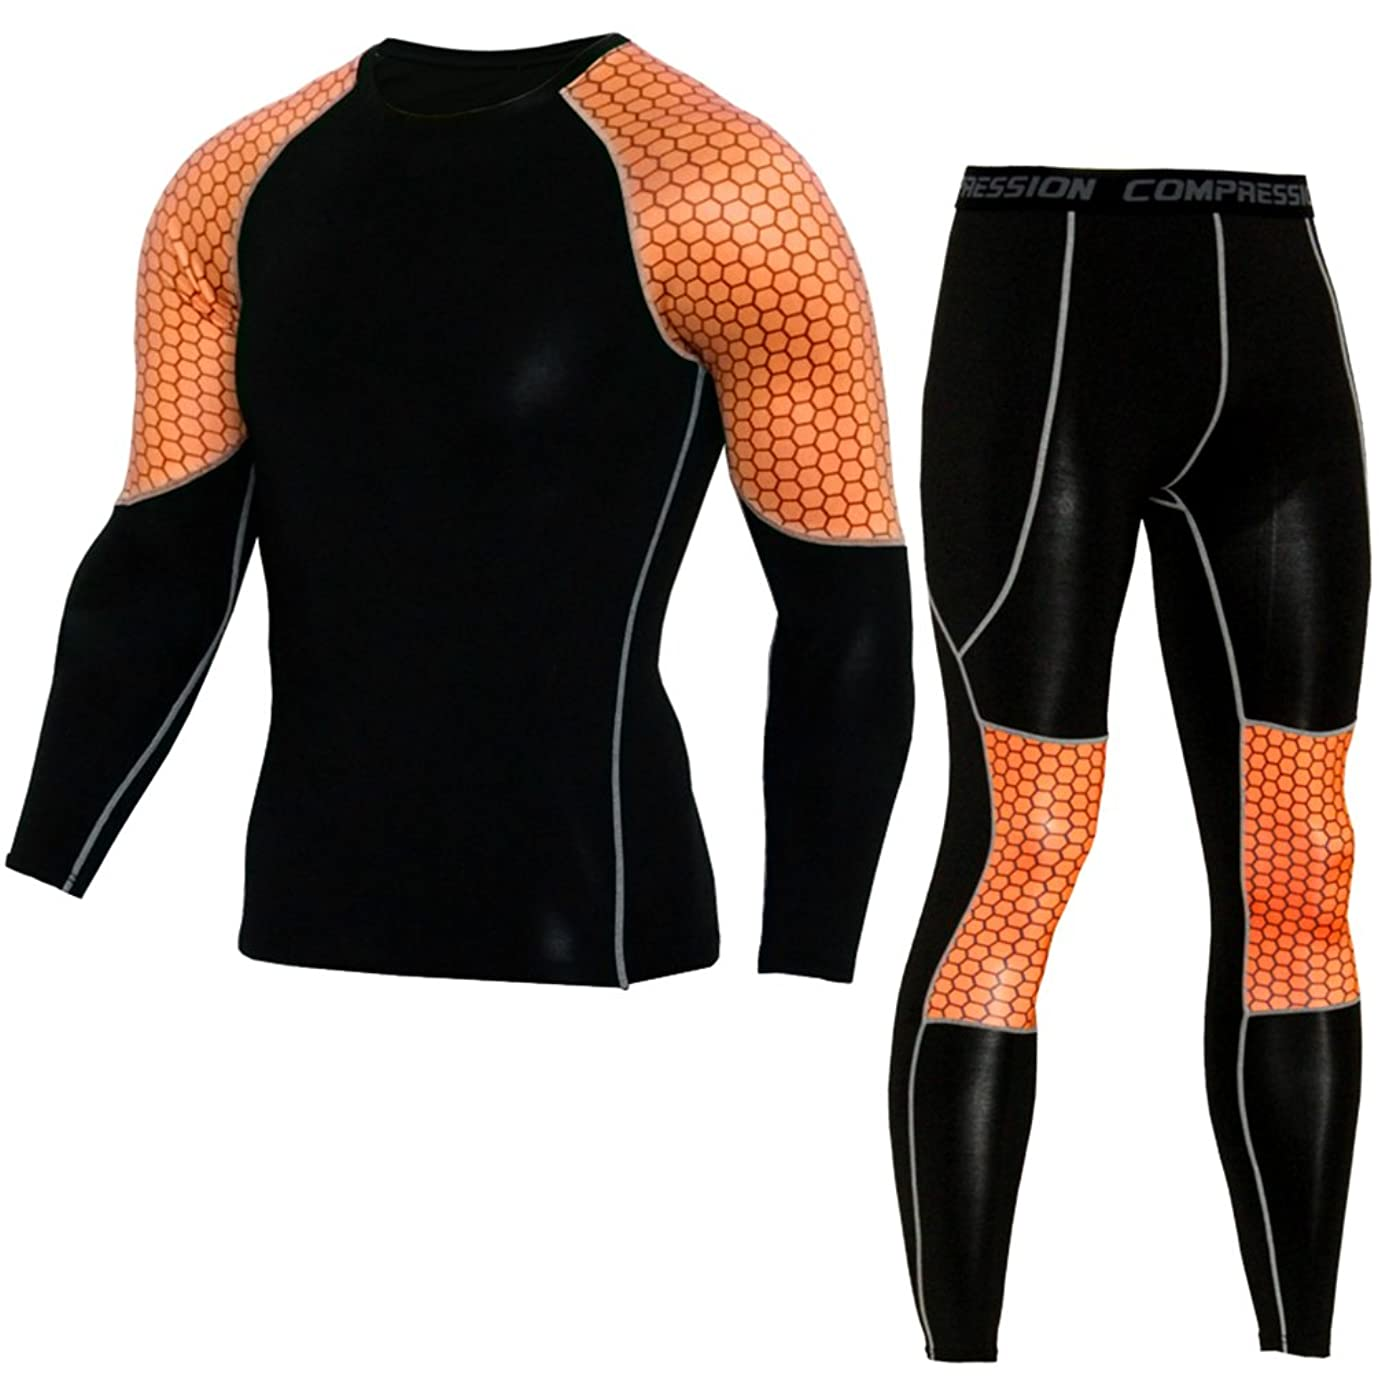 NATURET Compression Pants Running Tights & Men's Athletic Long Sleeve Baselayer Shirt Skin Fitness Lycra Set